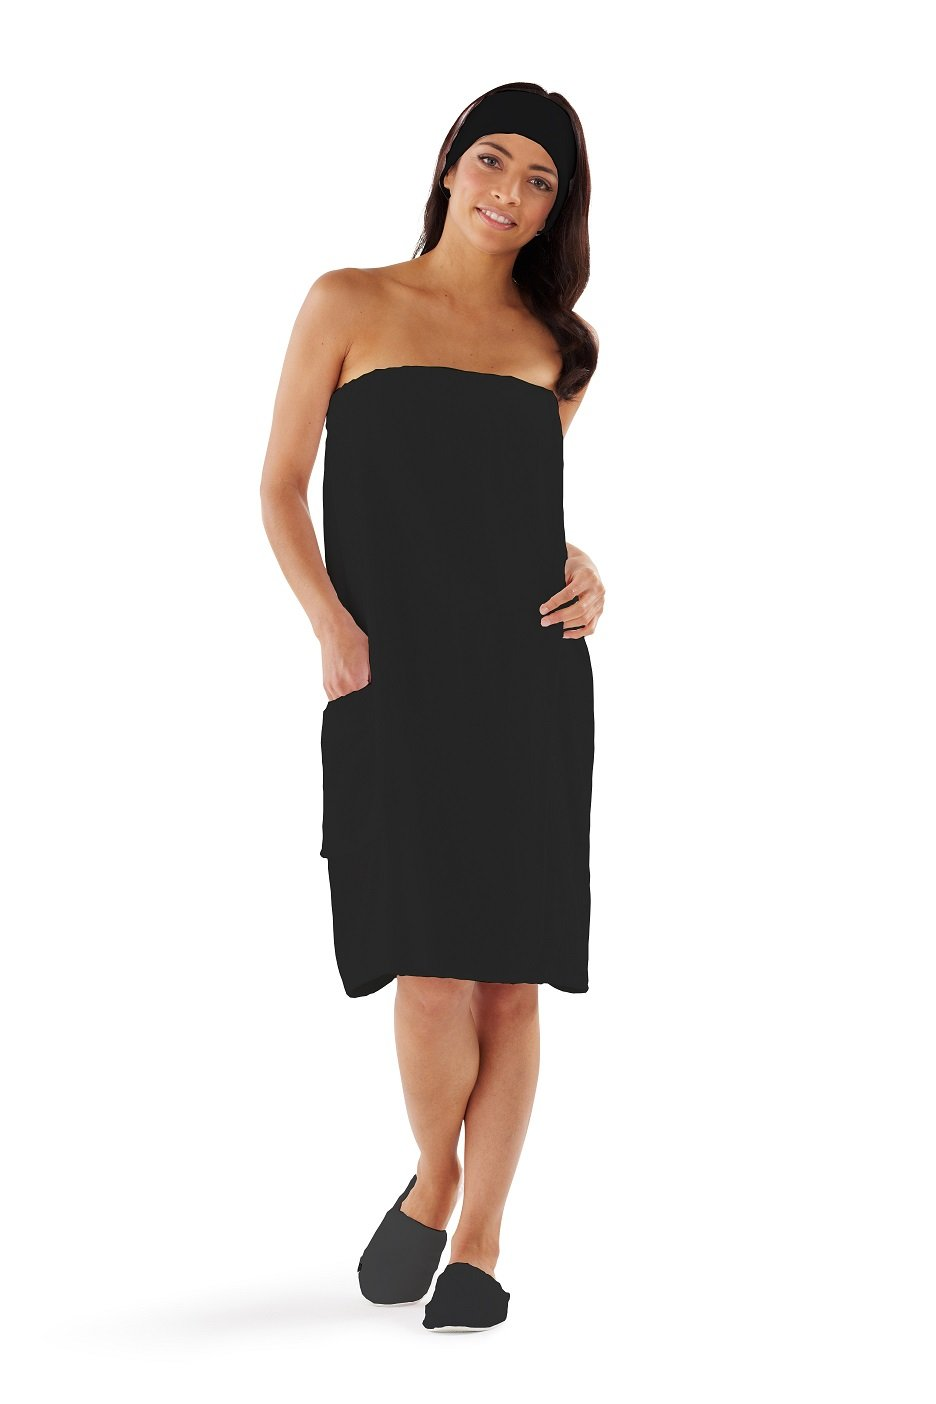 Boca Terry Womens Spa Wrap - 100% Cotton Spa, Shower, Bath and Gym Towel w Snaps - Med/Large, XXL, 4XL, 6XL Black